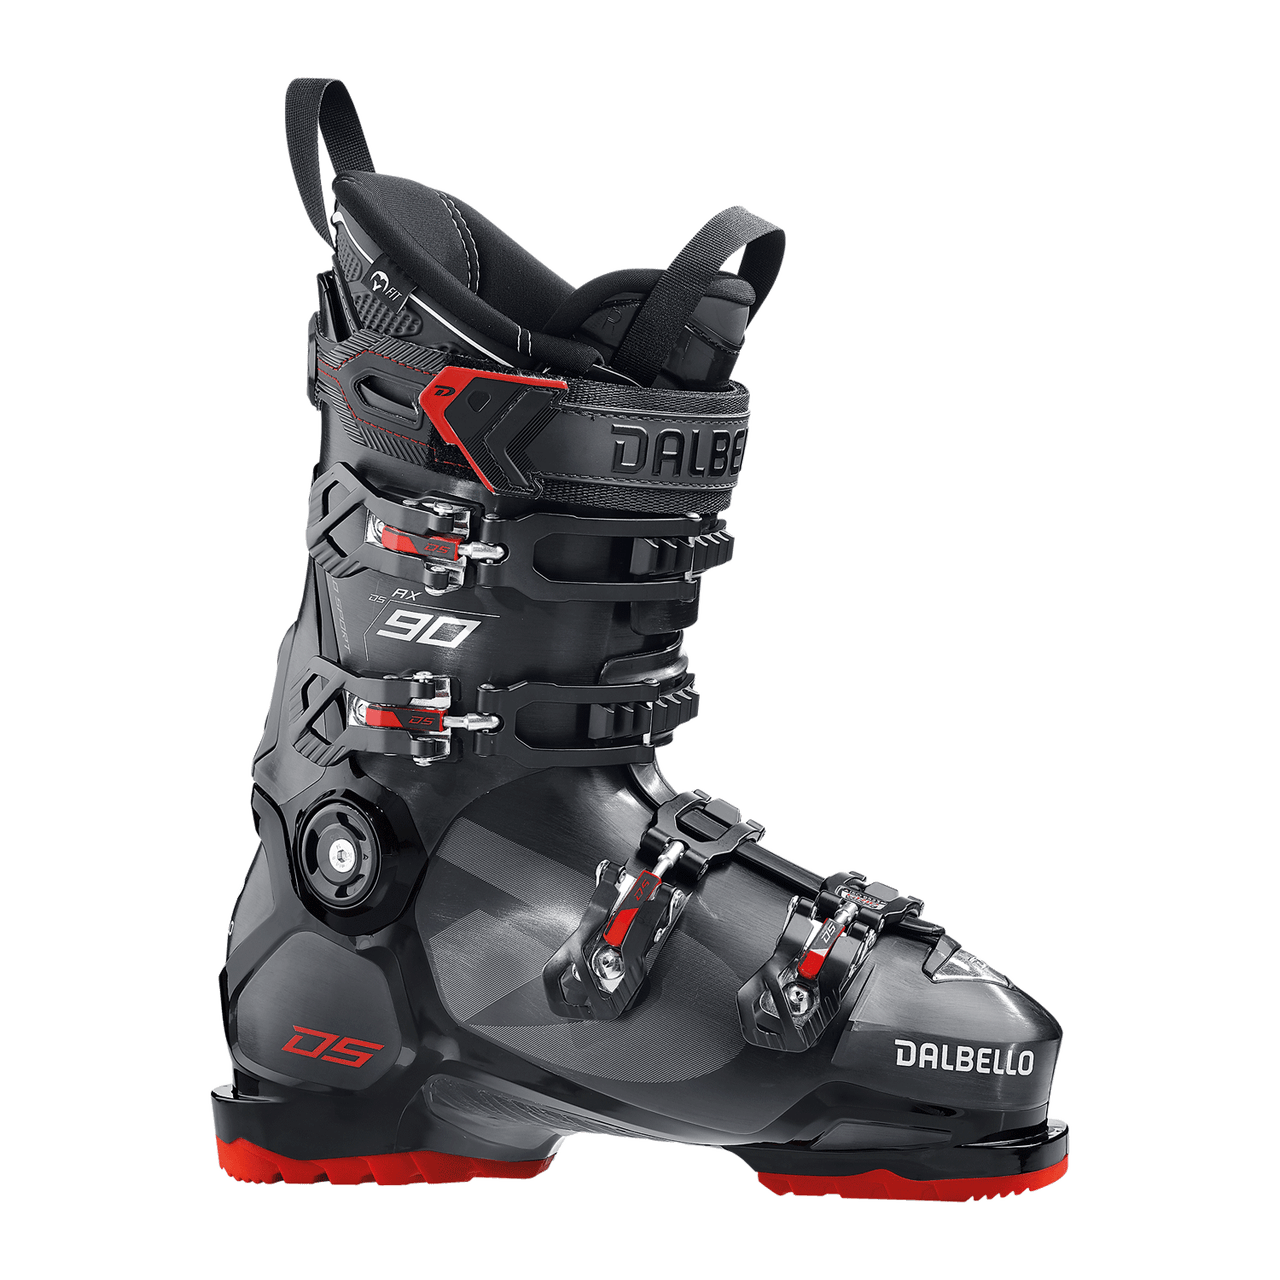 Dalbello Men's DS AX 90 Ski Boots · 2021